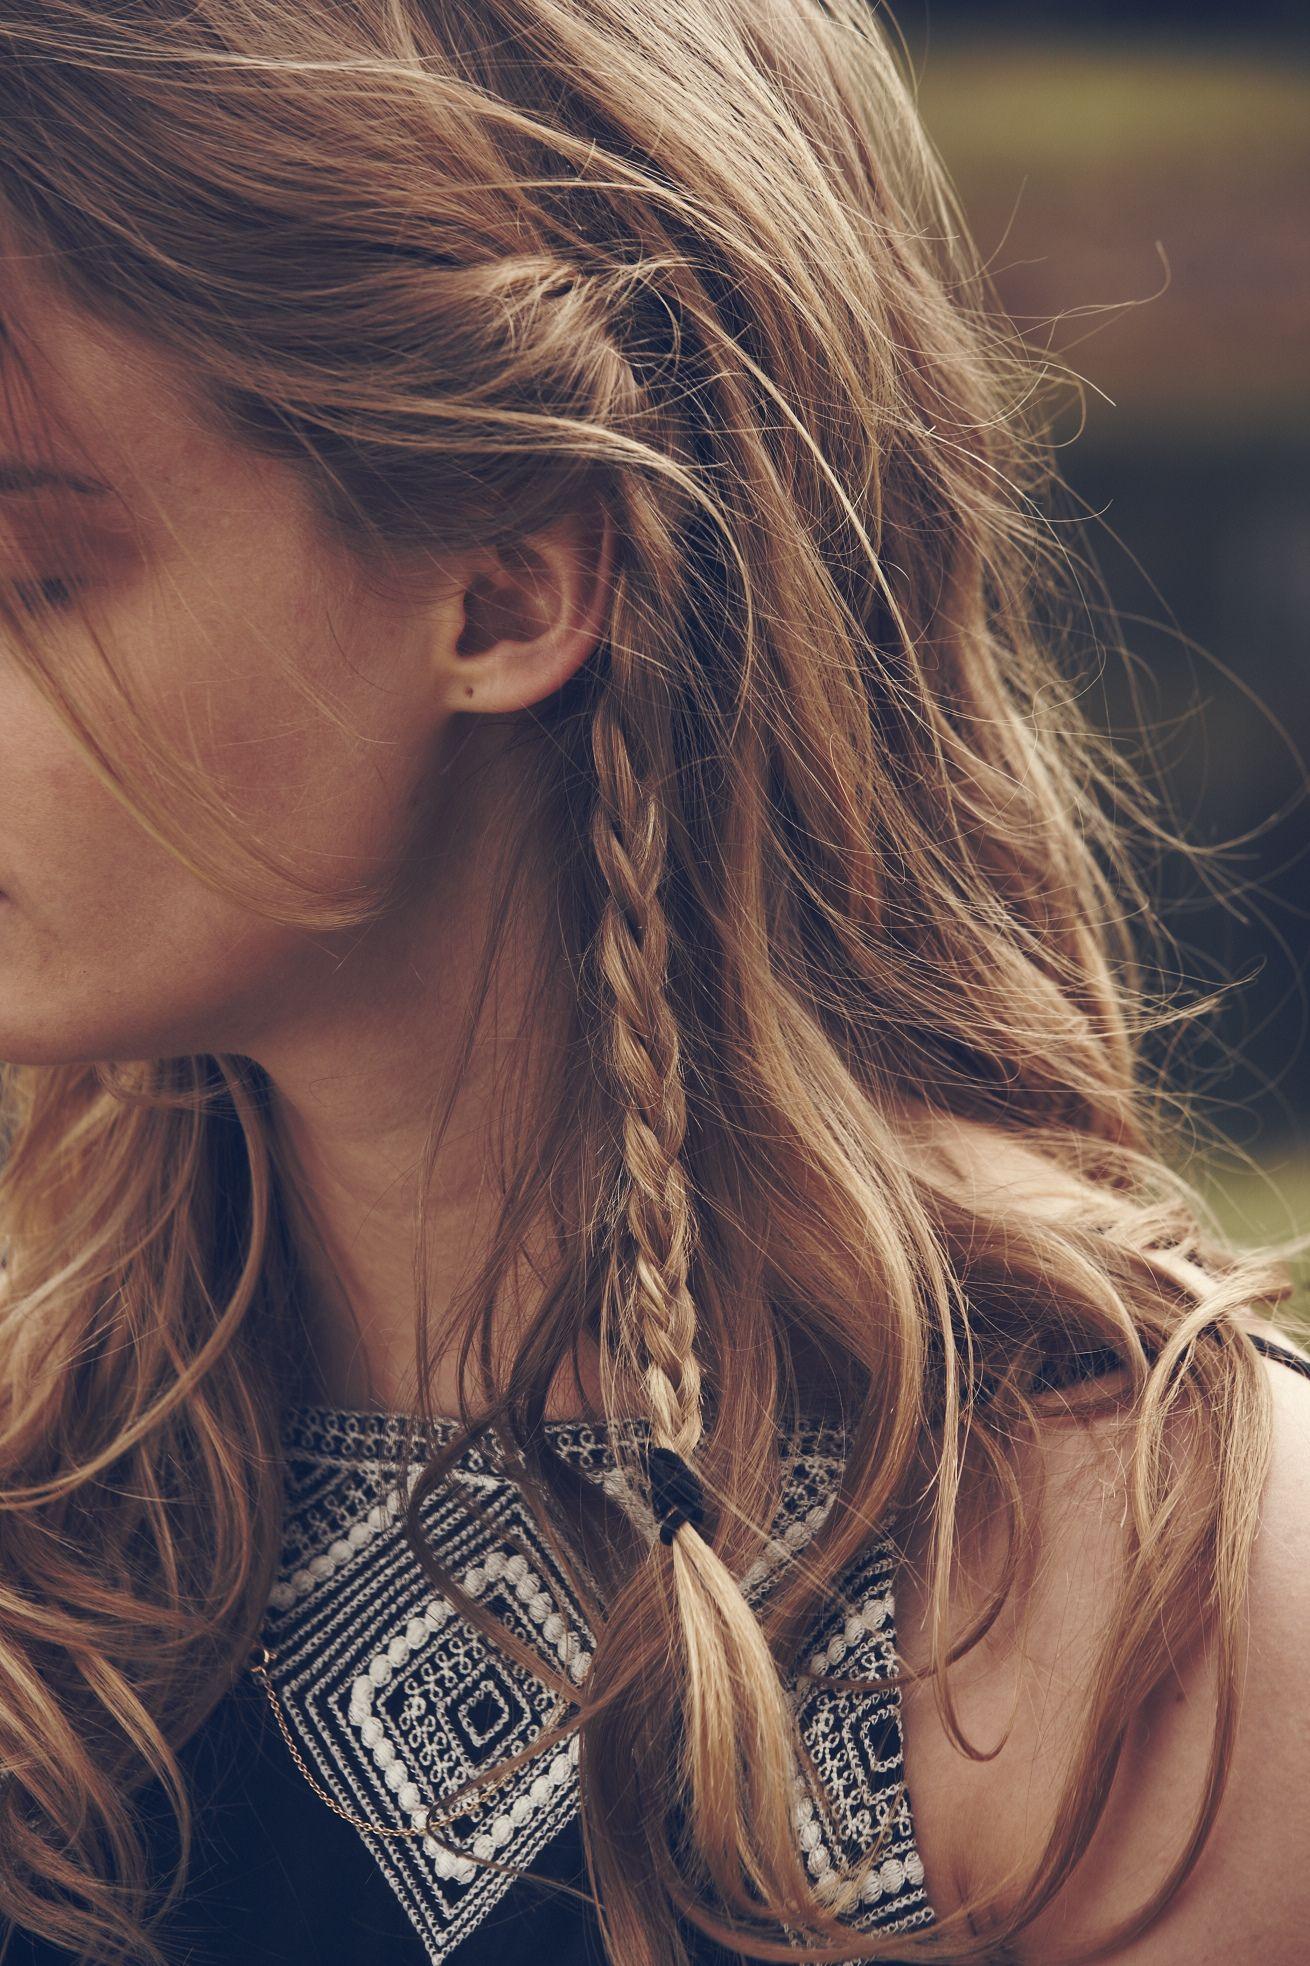 Hair Haare Boho Frisuren Bohemian Frisuren Hippie Frisur